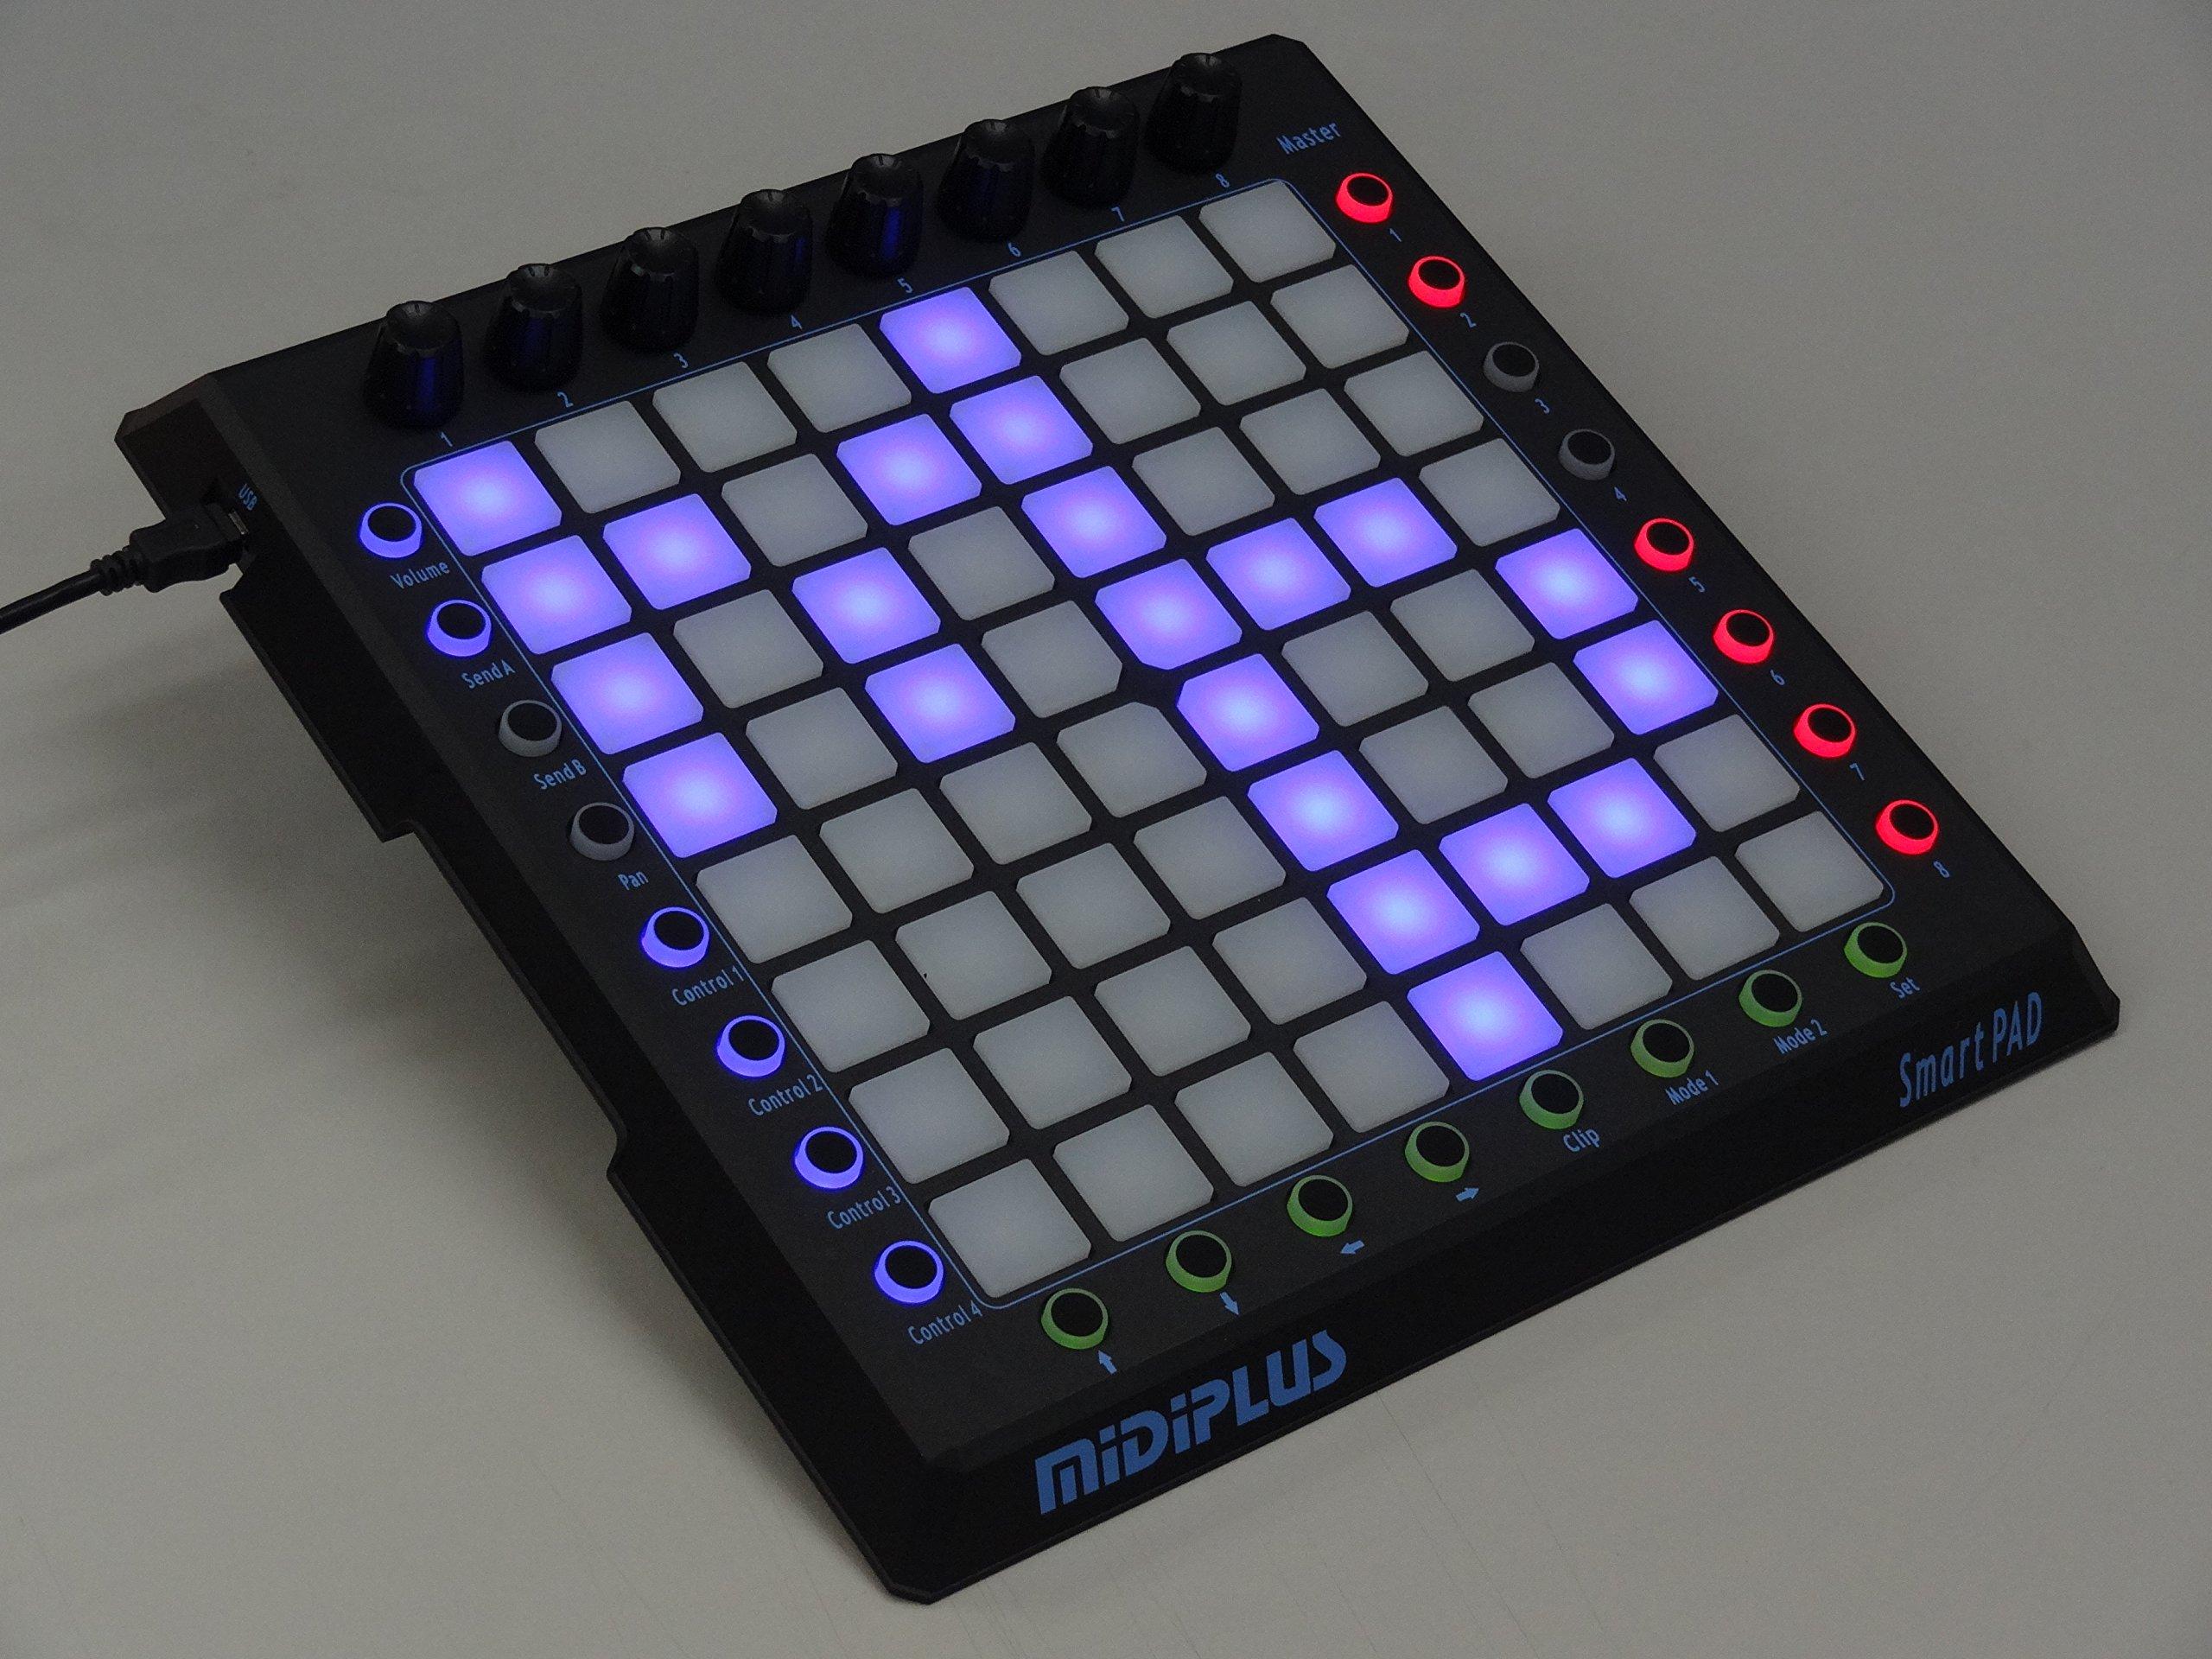 midiplus Smartpad USB MIDI Controller by Midiplus